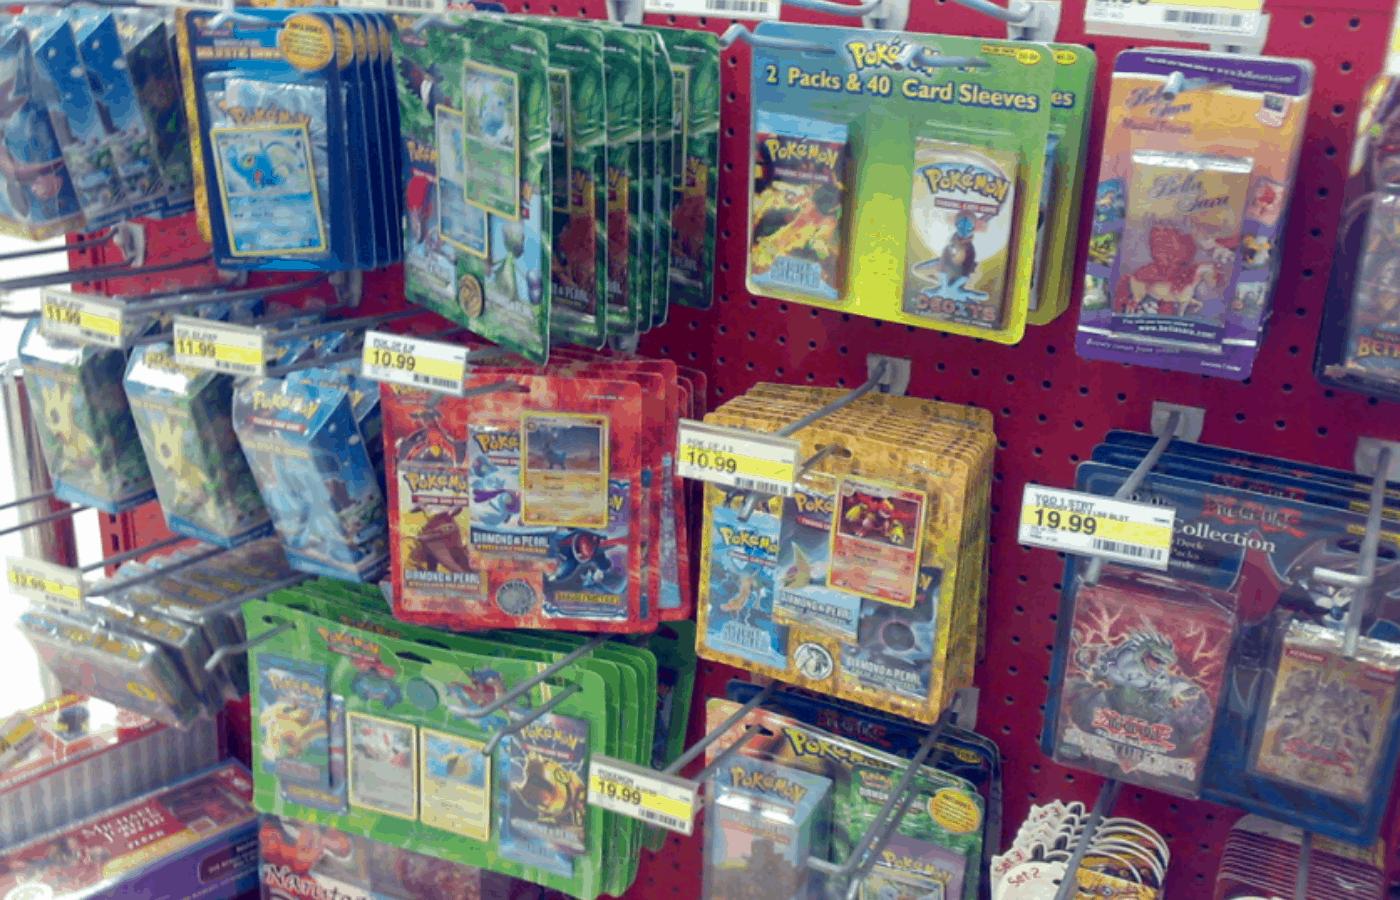 How Often Does Target/Walmart Restock Pokemon Cards